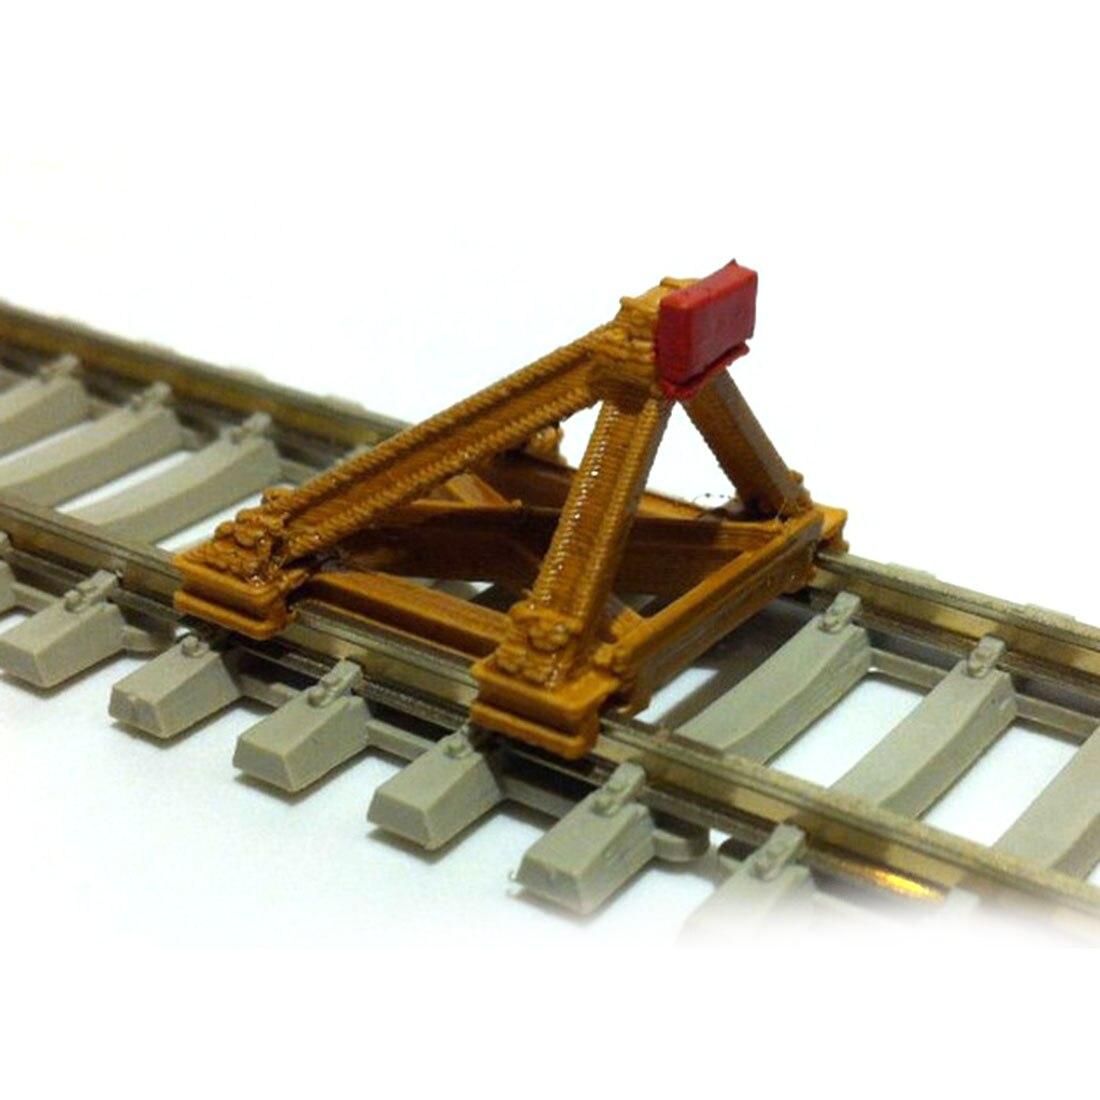 1:87 Track Scene Decoration Buffer Barricade Model For Sand Table HO Scale Train Model